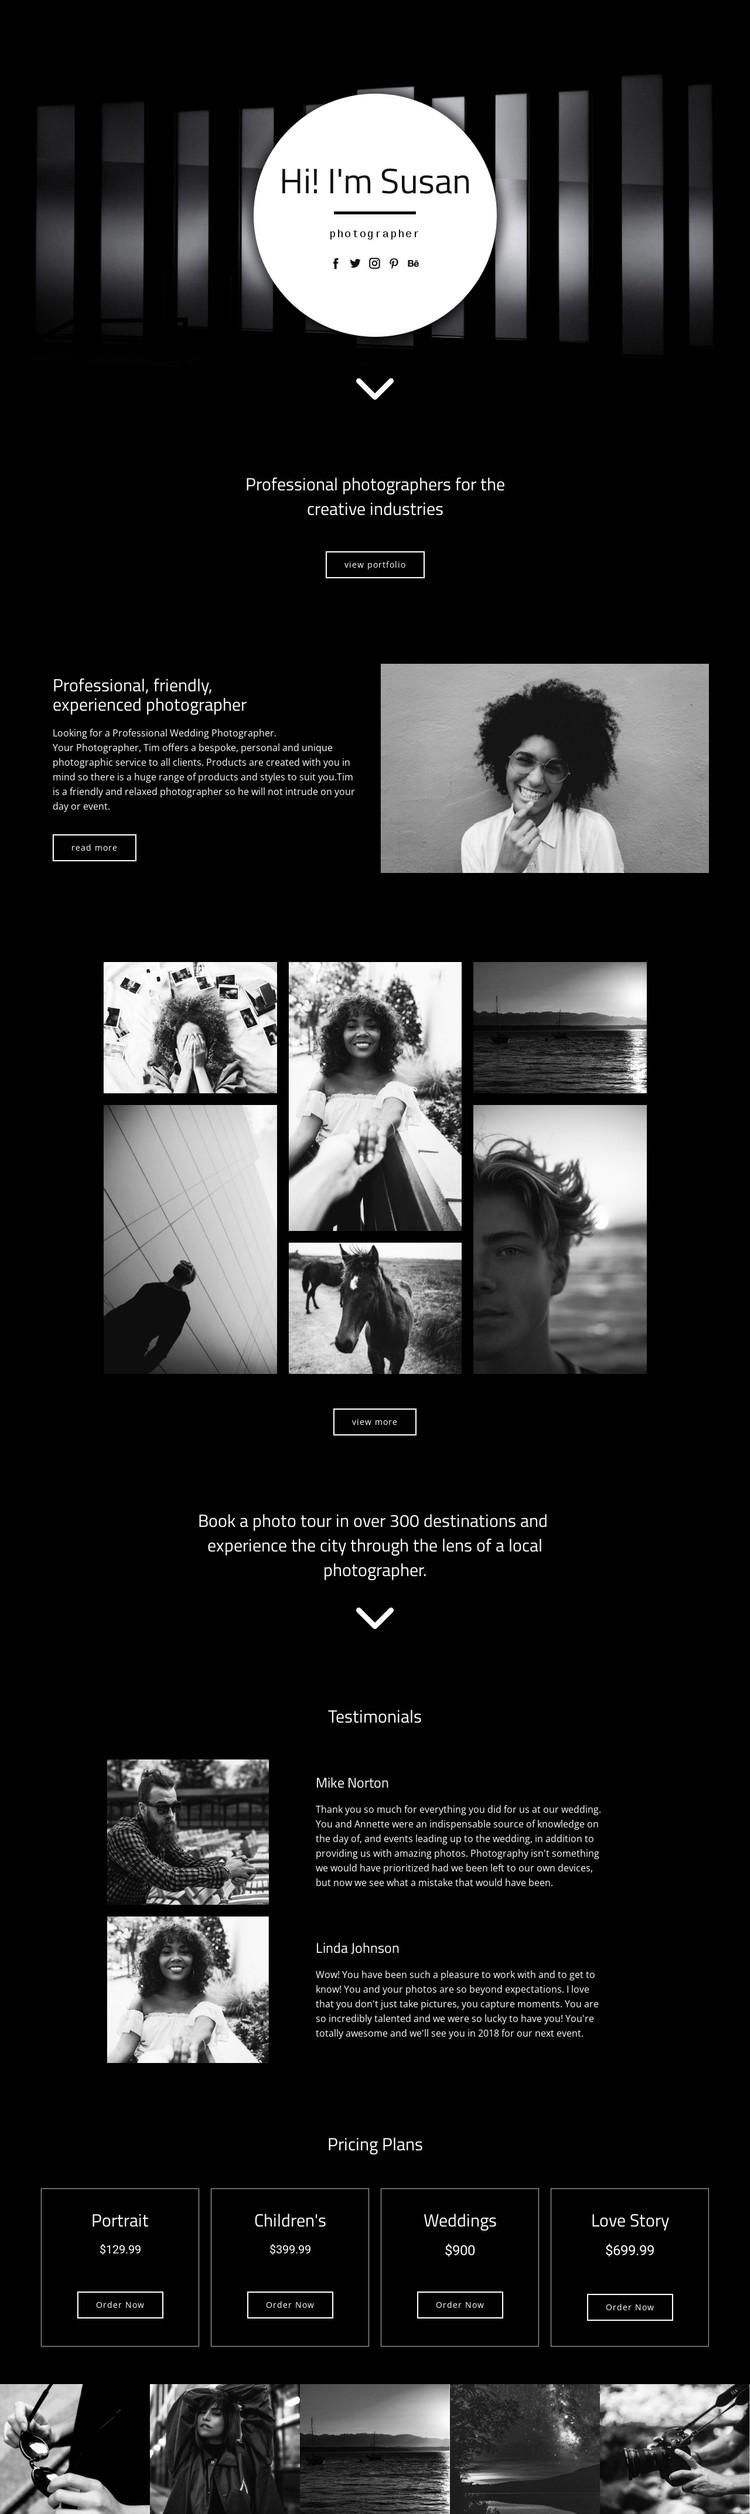 Your Photographer Static Site Generator